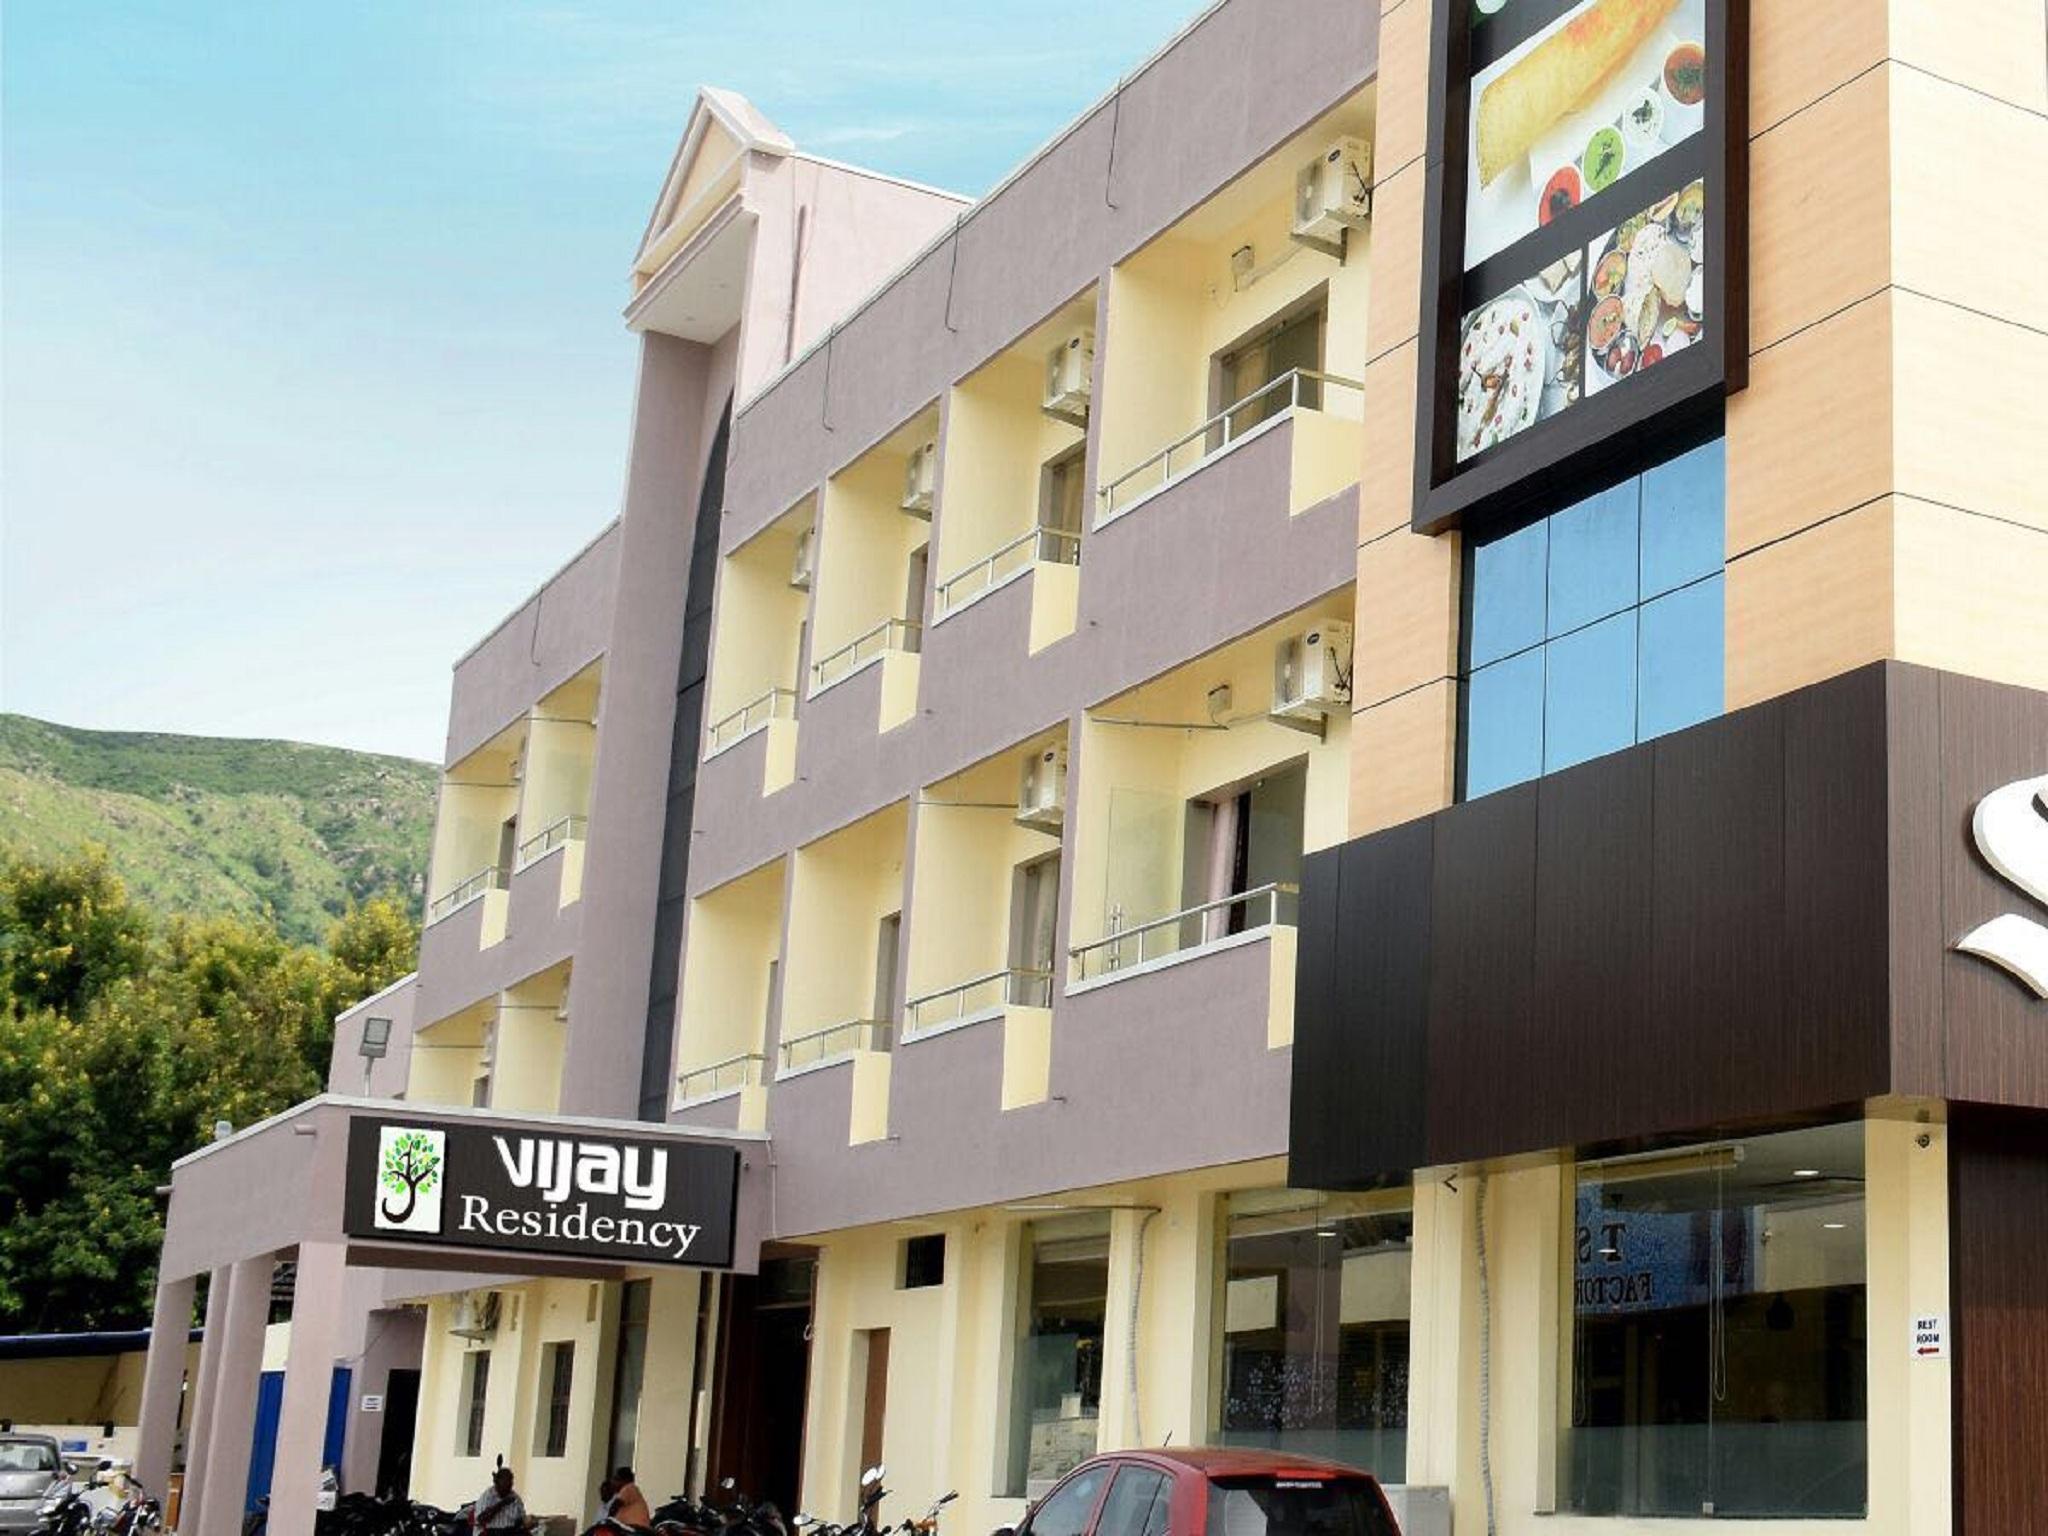 Vijay Residency, Vellore